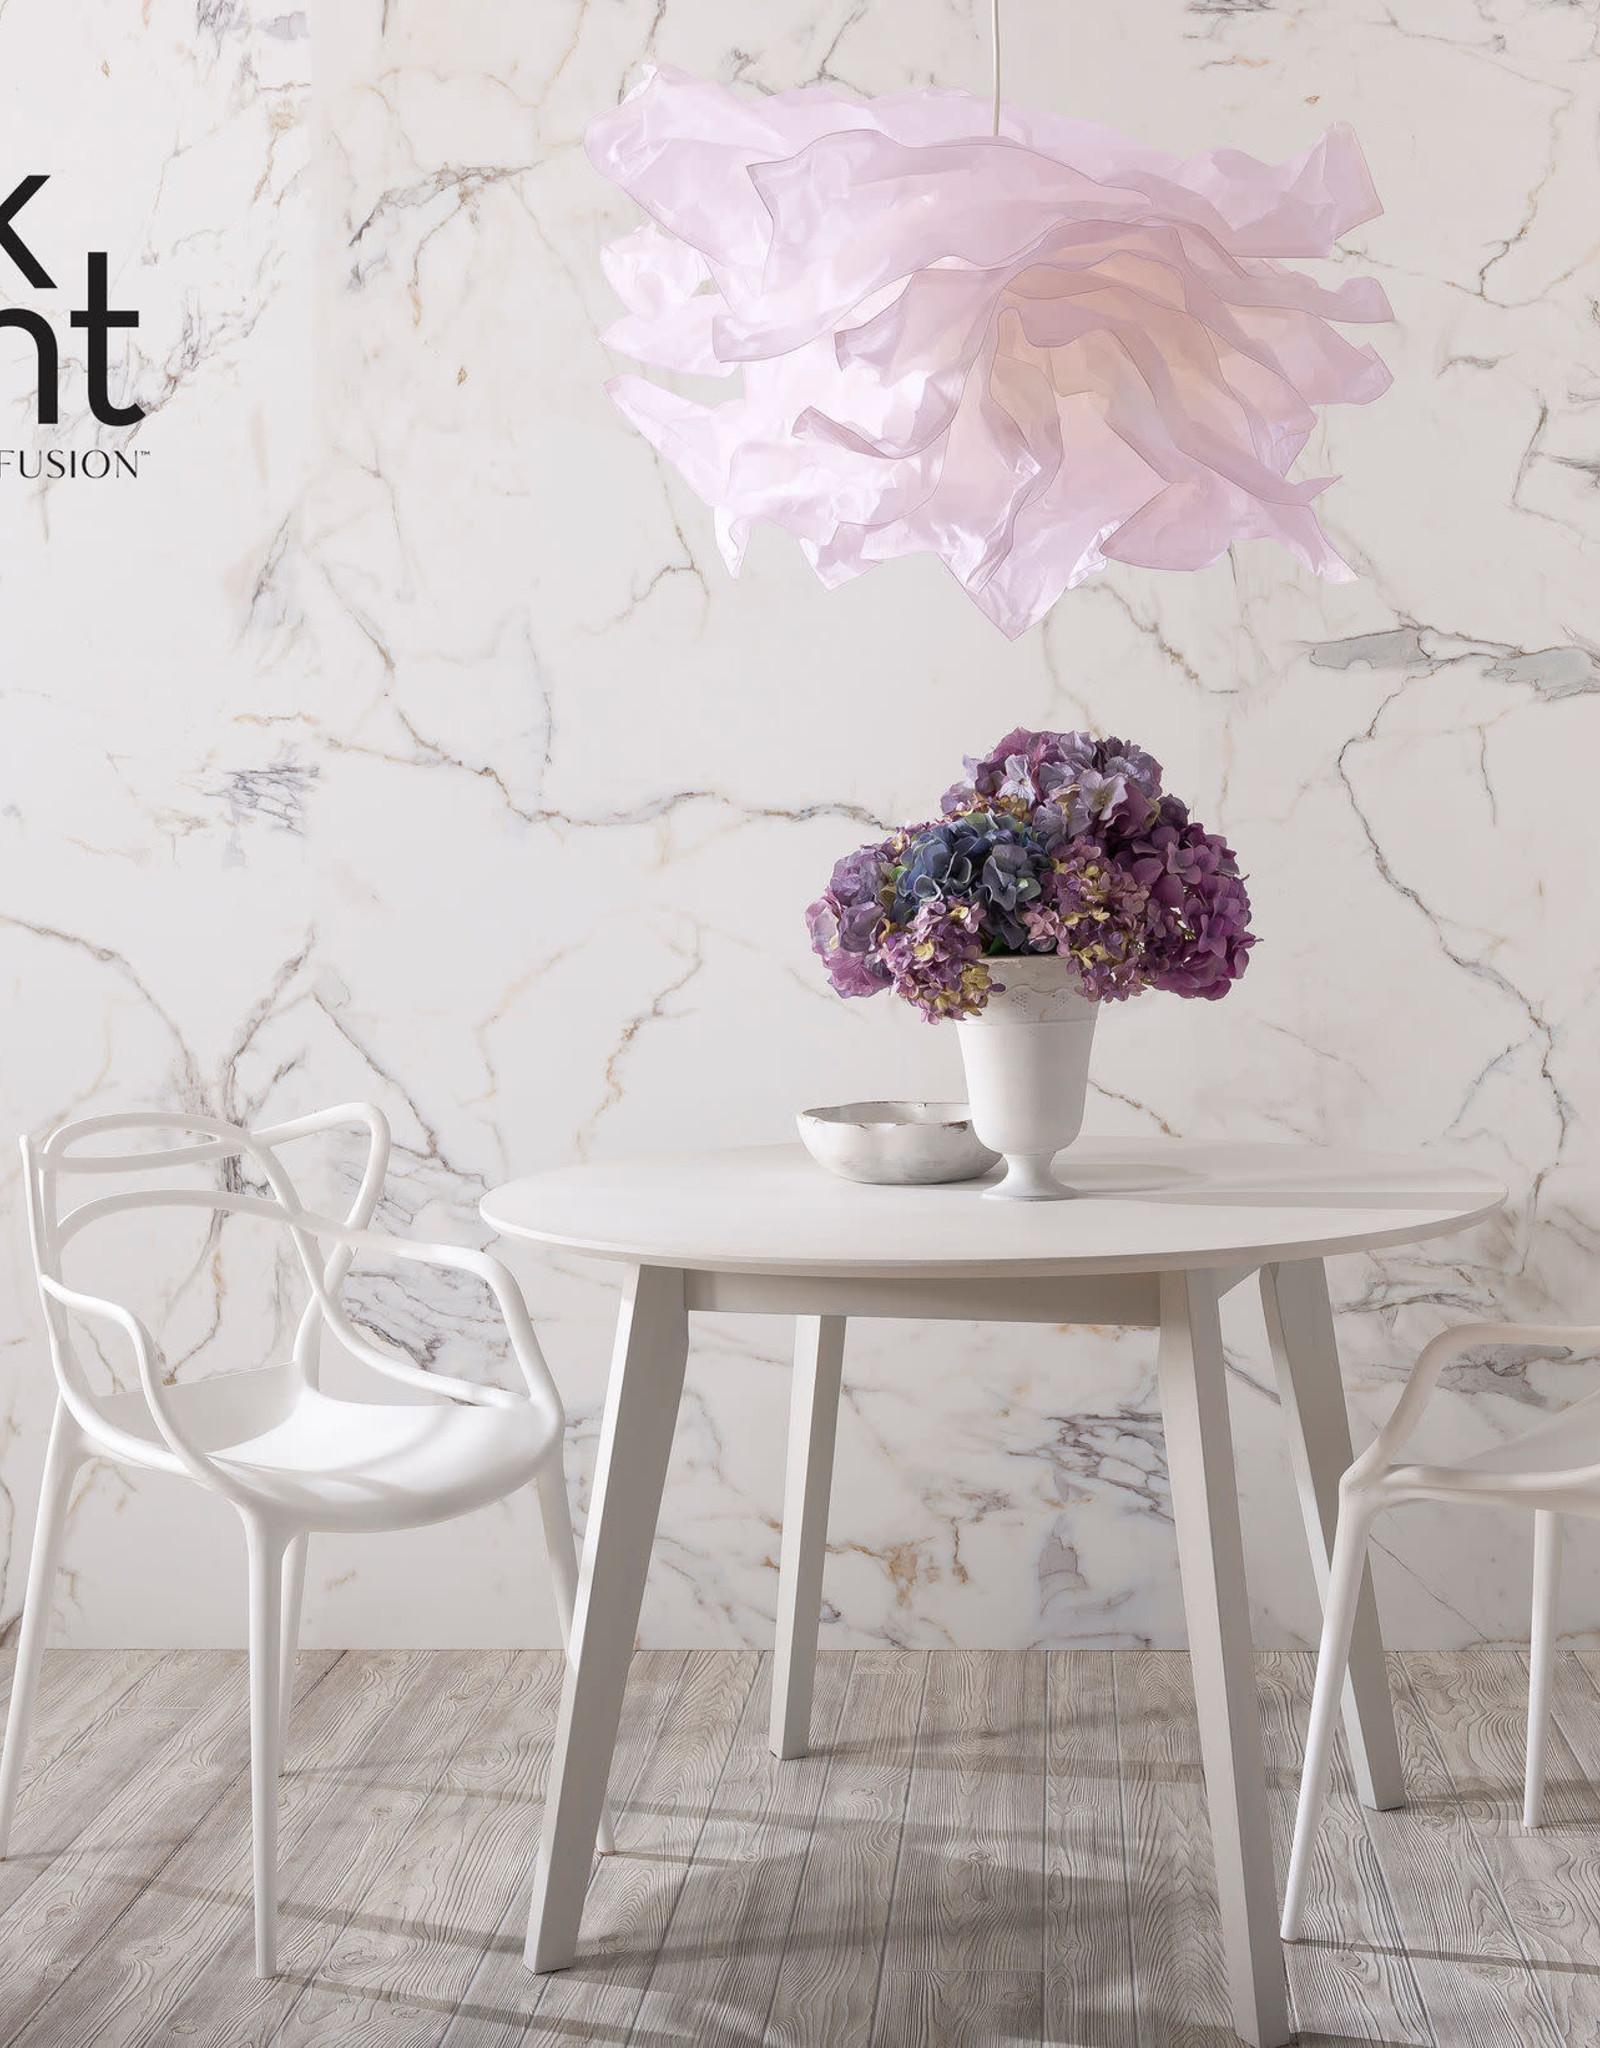 Fusion Mineral Paint Milk Paint 50g Marble